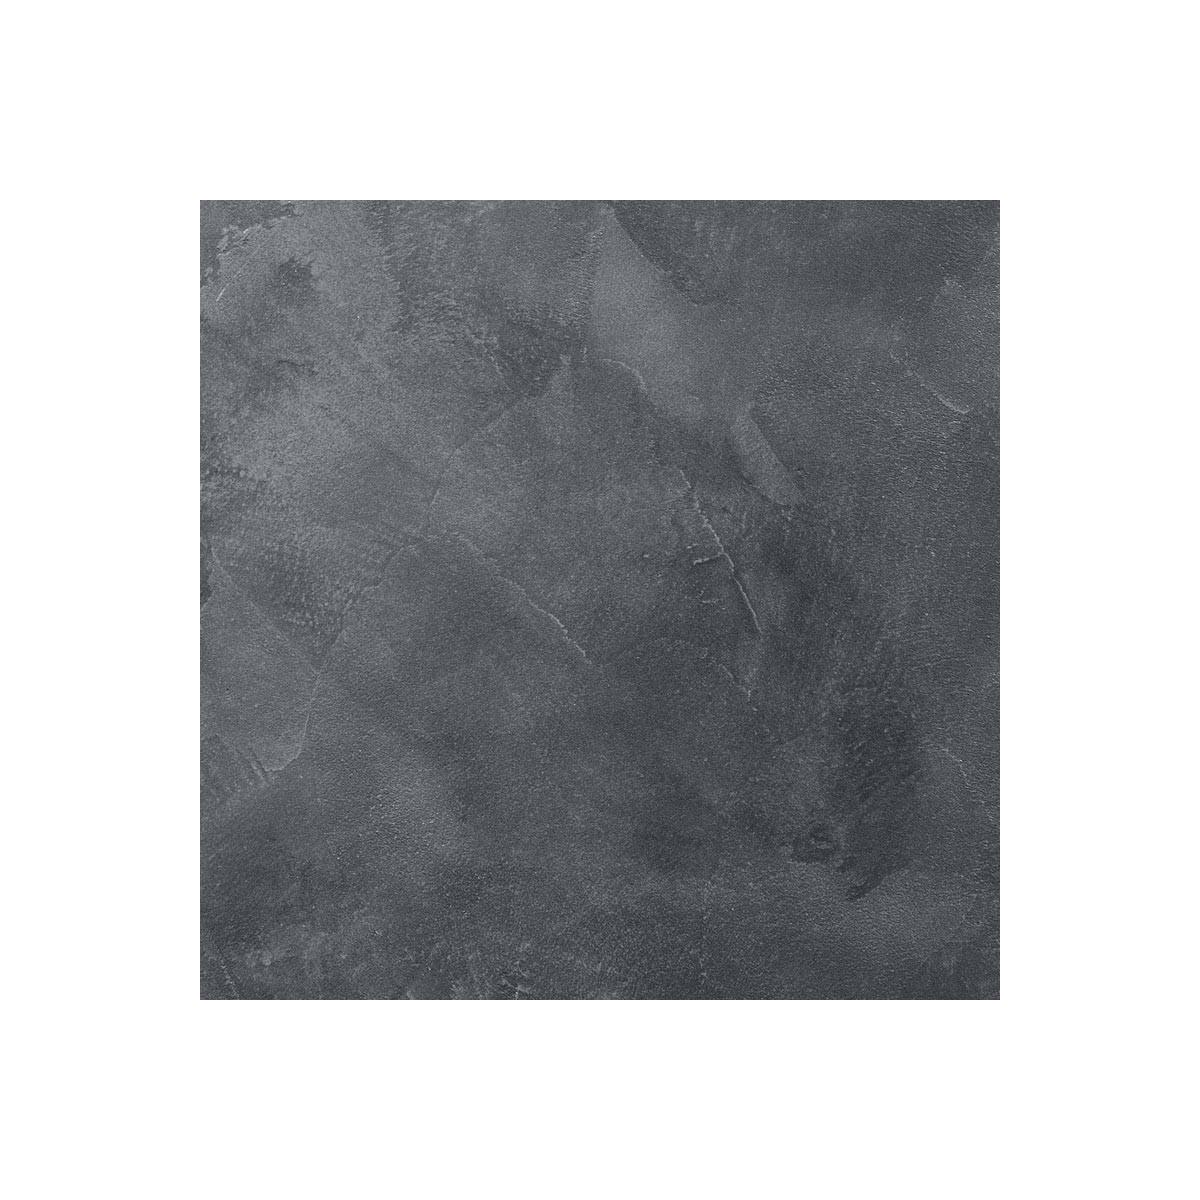 B ton cir sur carrelage cuisine salle de bain mural sol for Beton cire sur carrelage sol